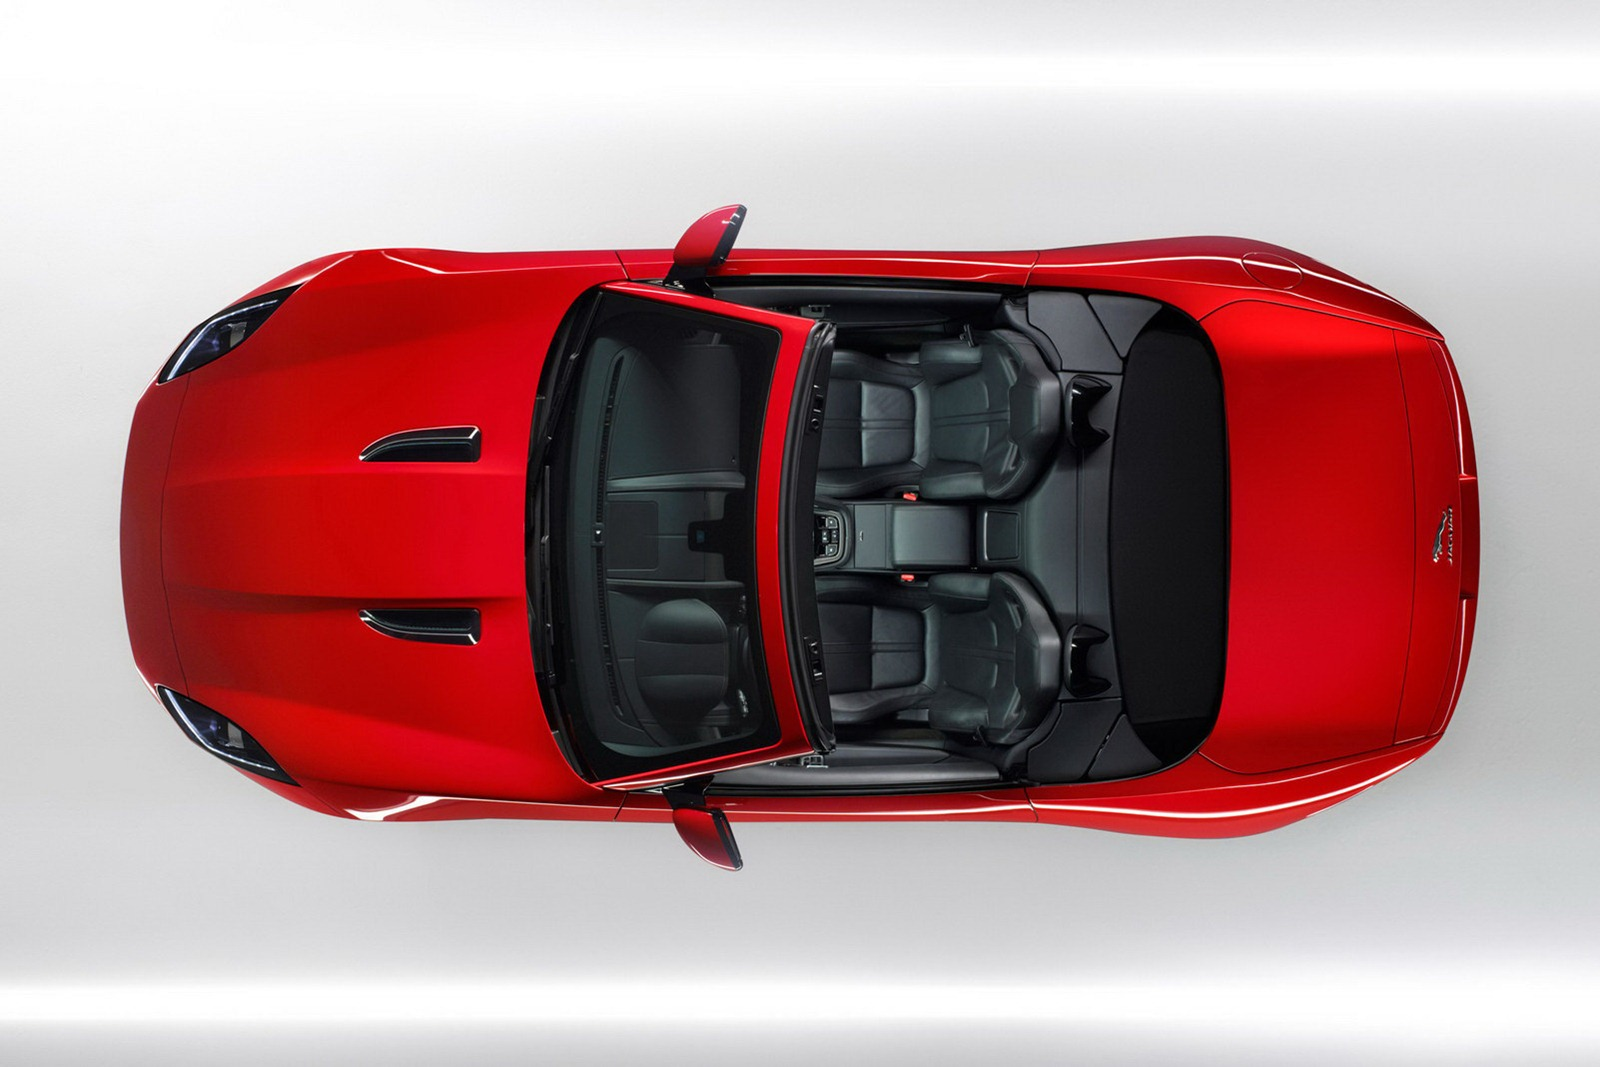 New 2013 Jaguar F Type Roadster Price Starts At 69 000